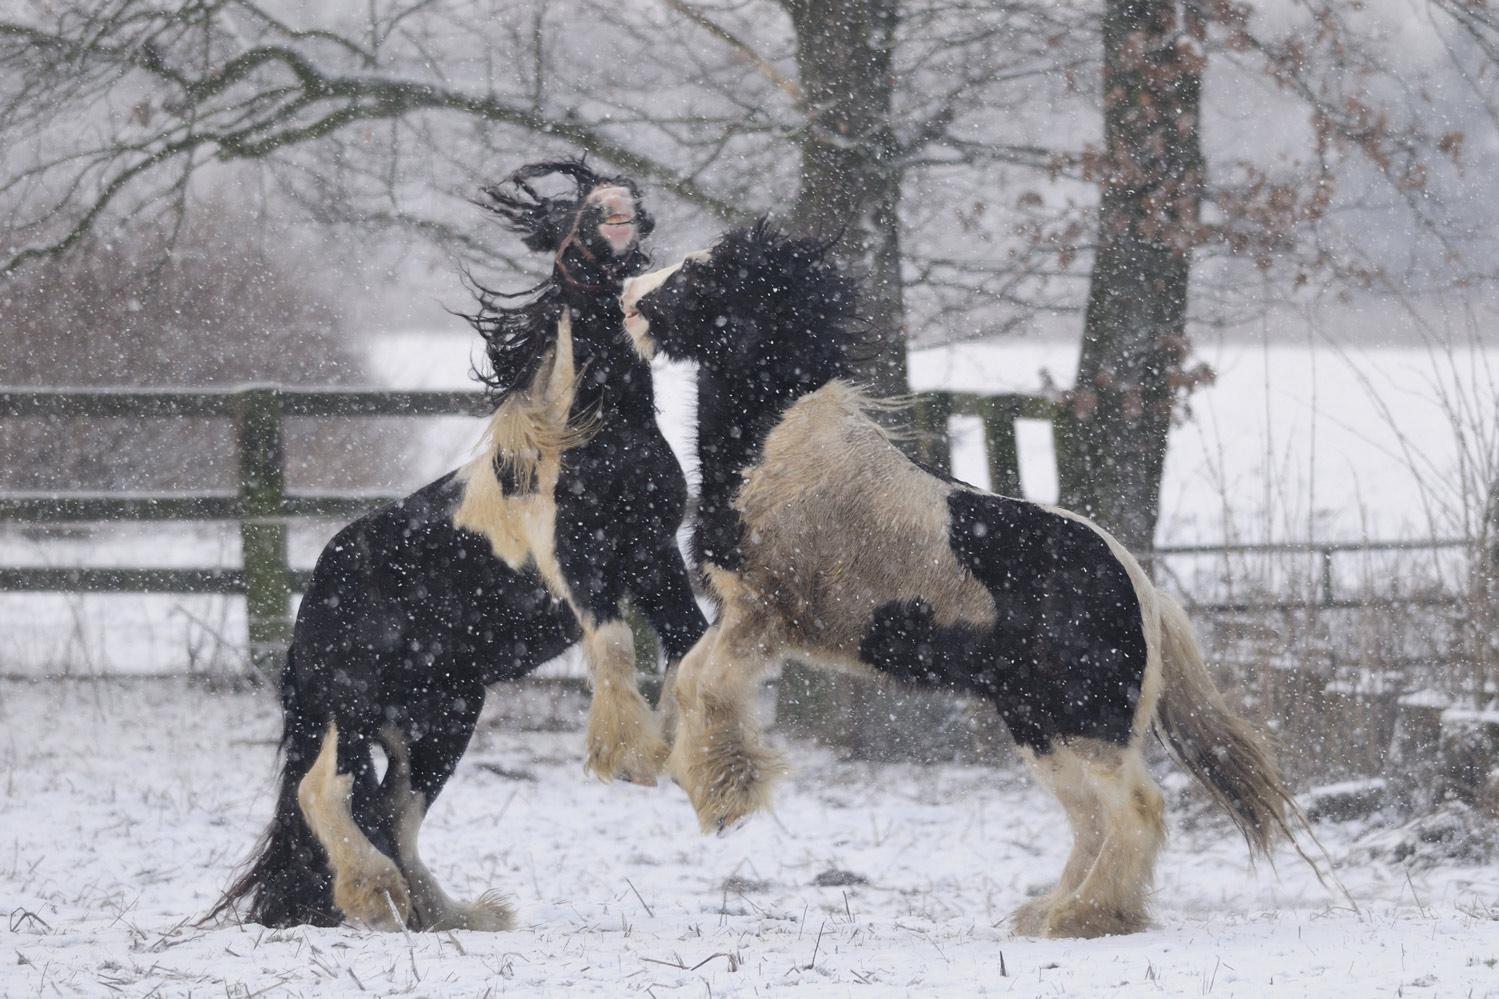 pferde im schnee foto bild tiere haustiere pferde. Black Bedroom Furniture Sets. Home Design Ideas